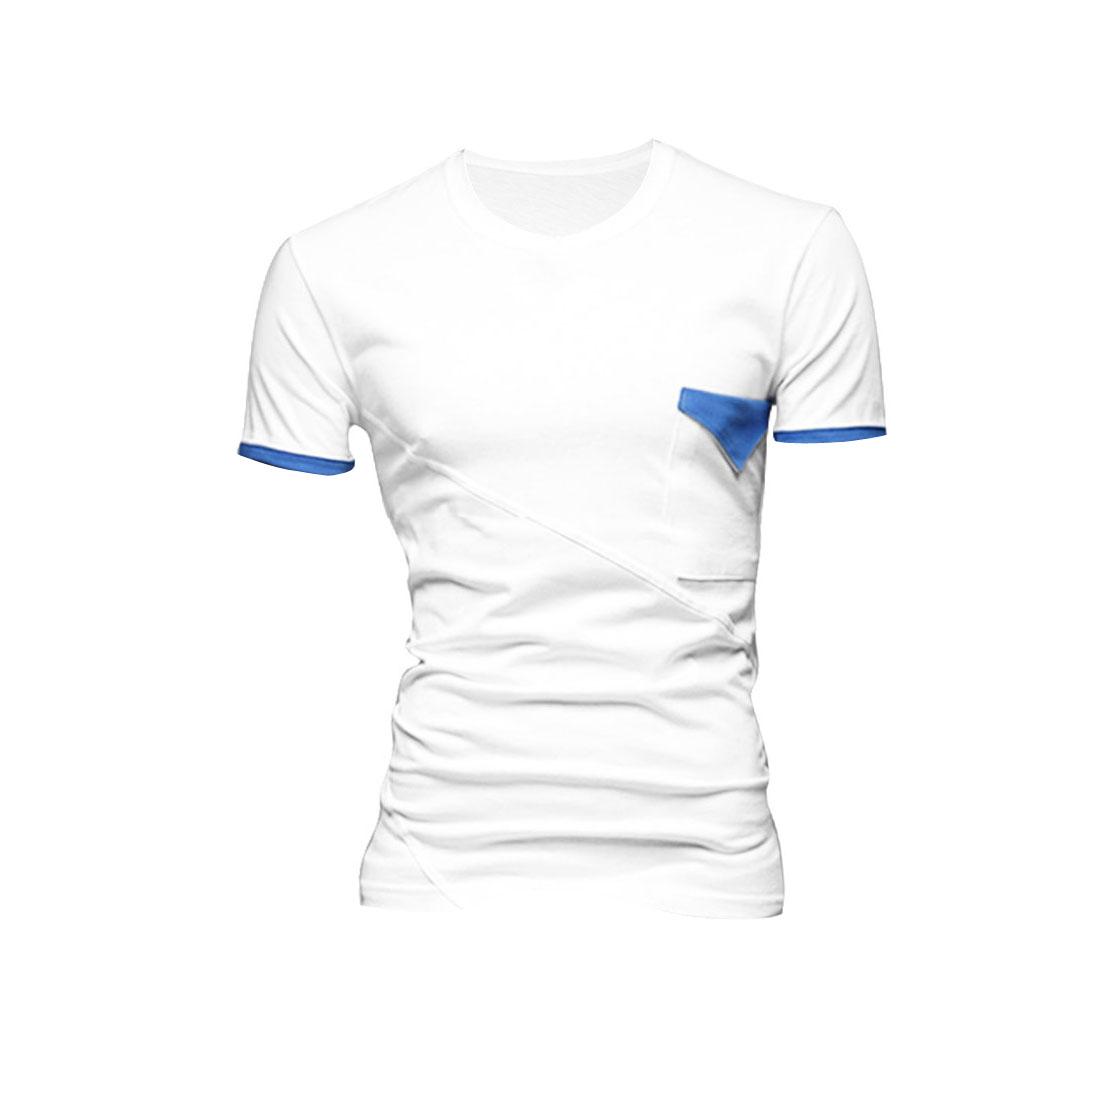 Men Round Neck Pullover Splice Cuffs Stretchy Shirt White M